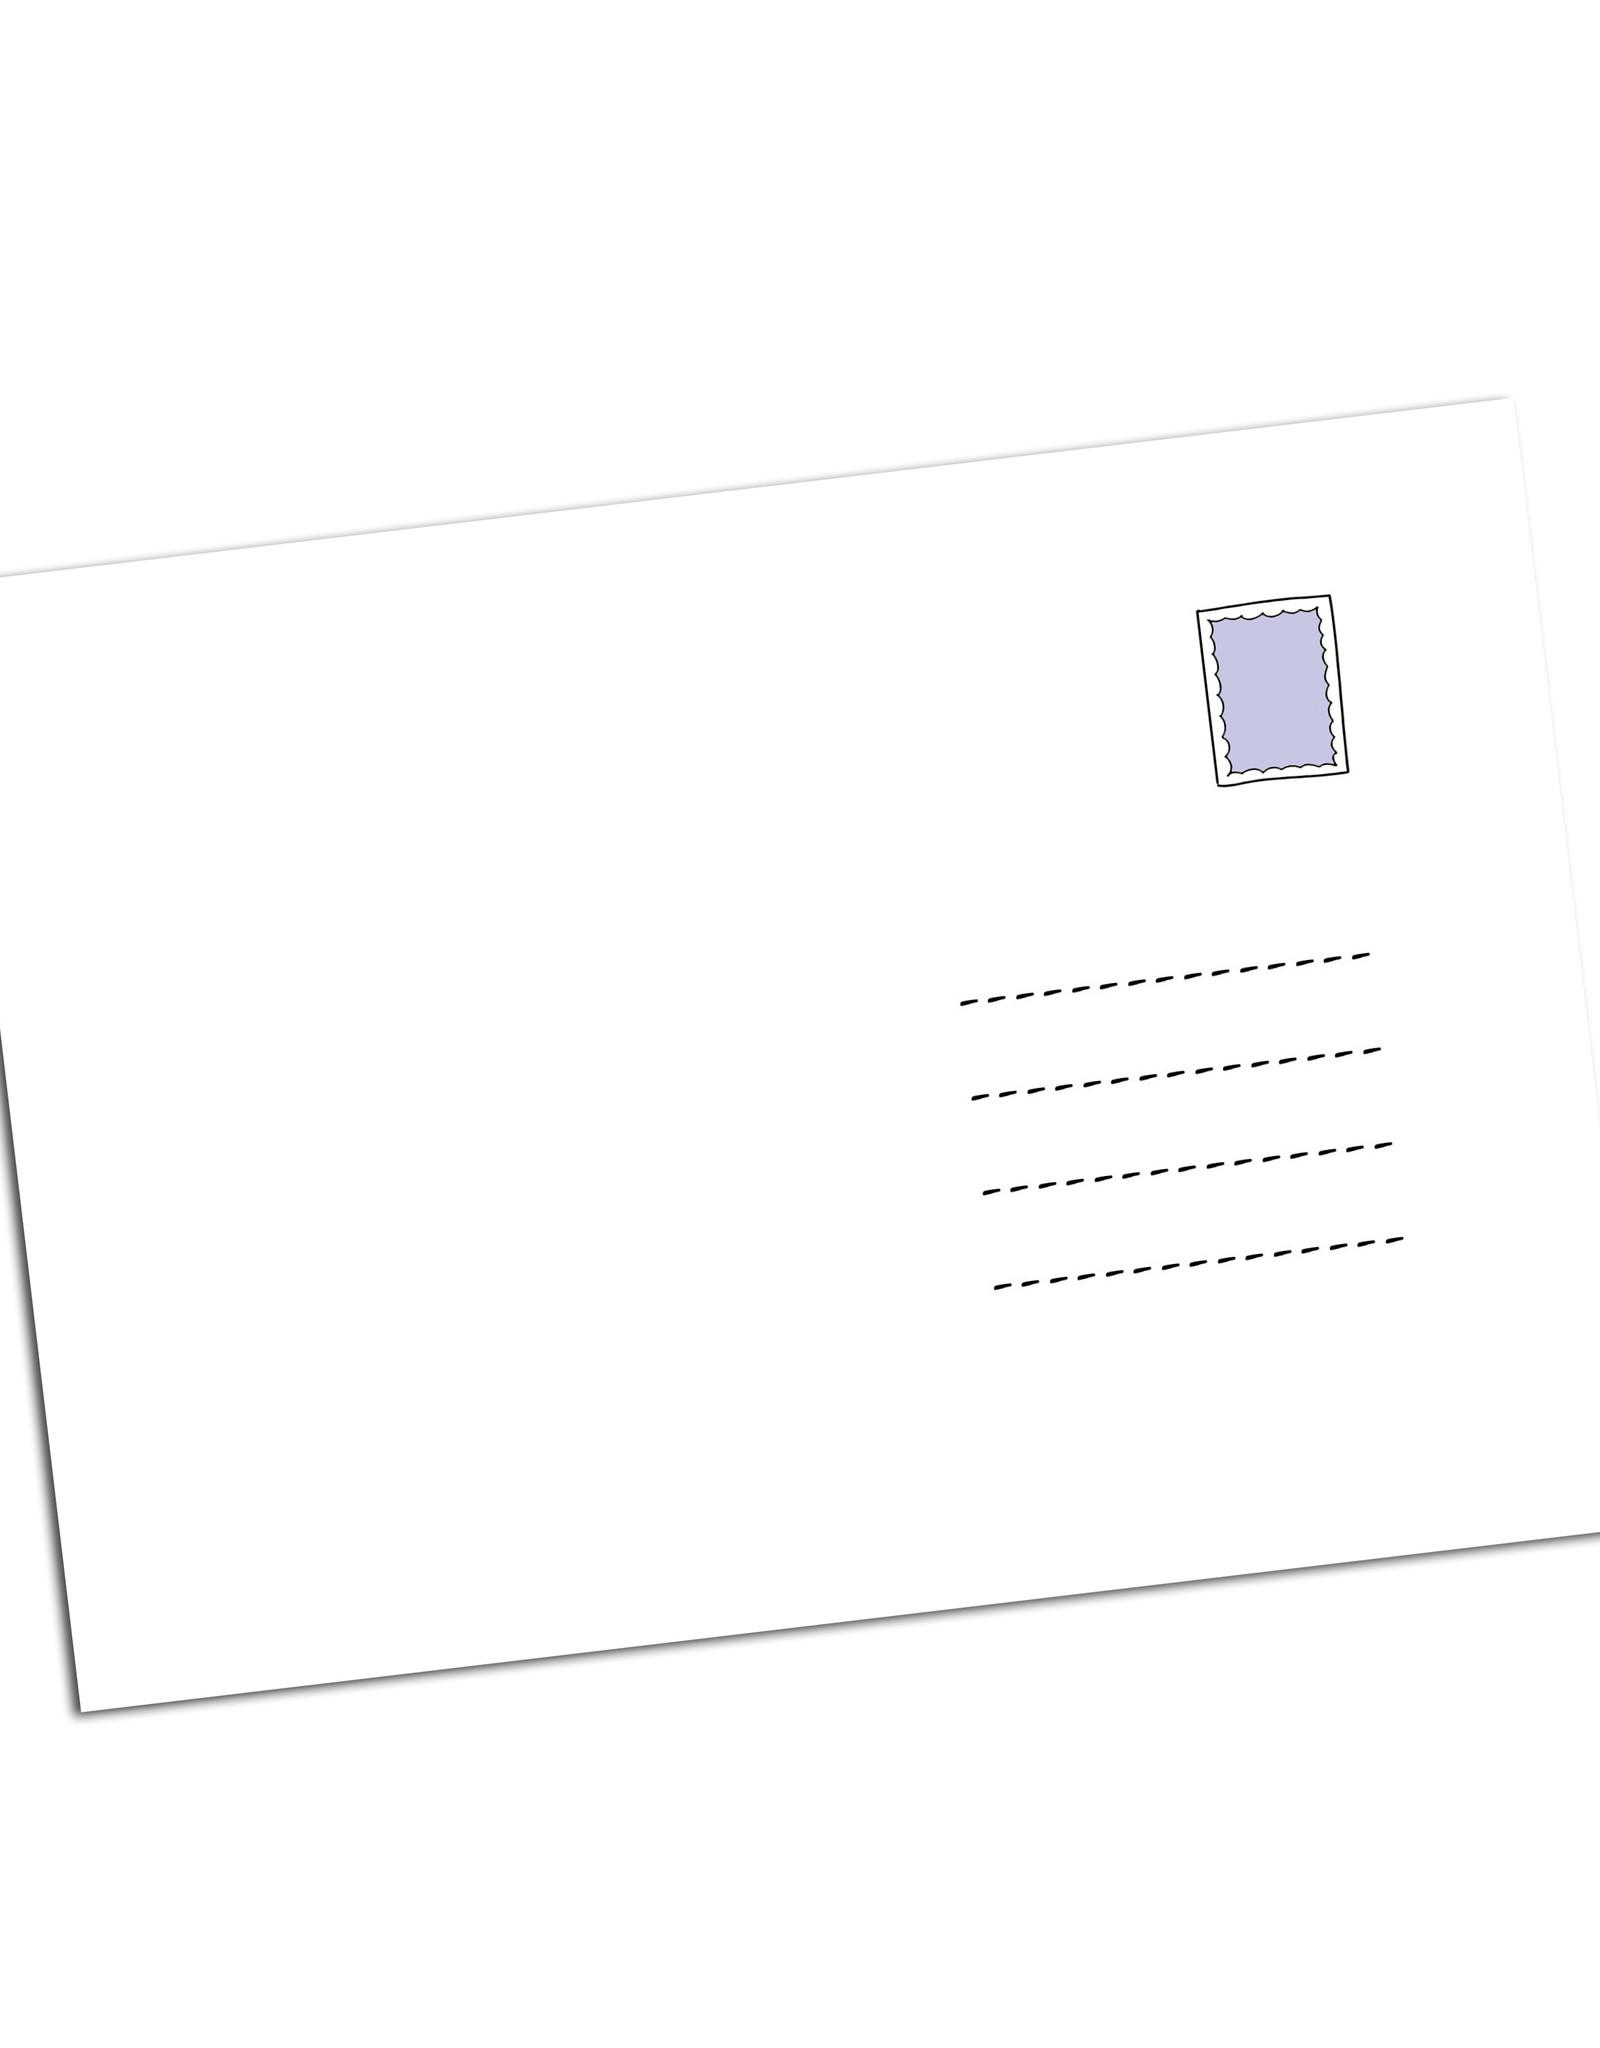 100 Postkarten Danke für den Einkauf Dankeskarten Grußkarten Postkarten Set